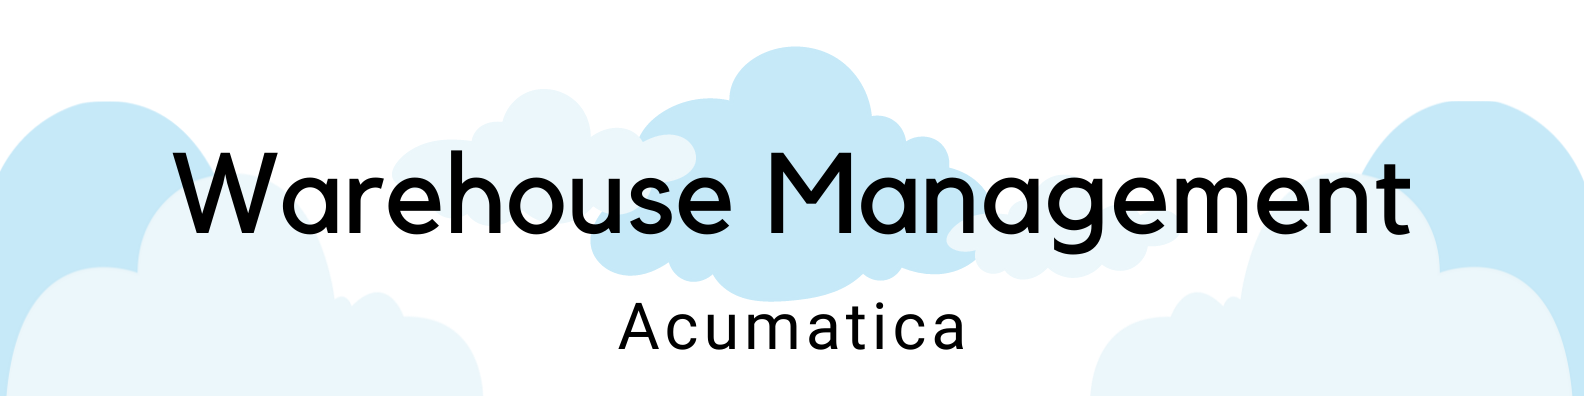 ICAN Warehouse Management Acumatica header